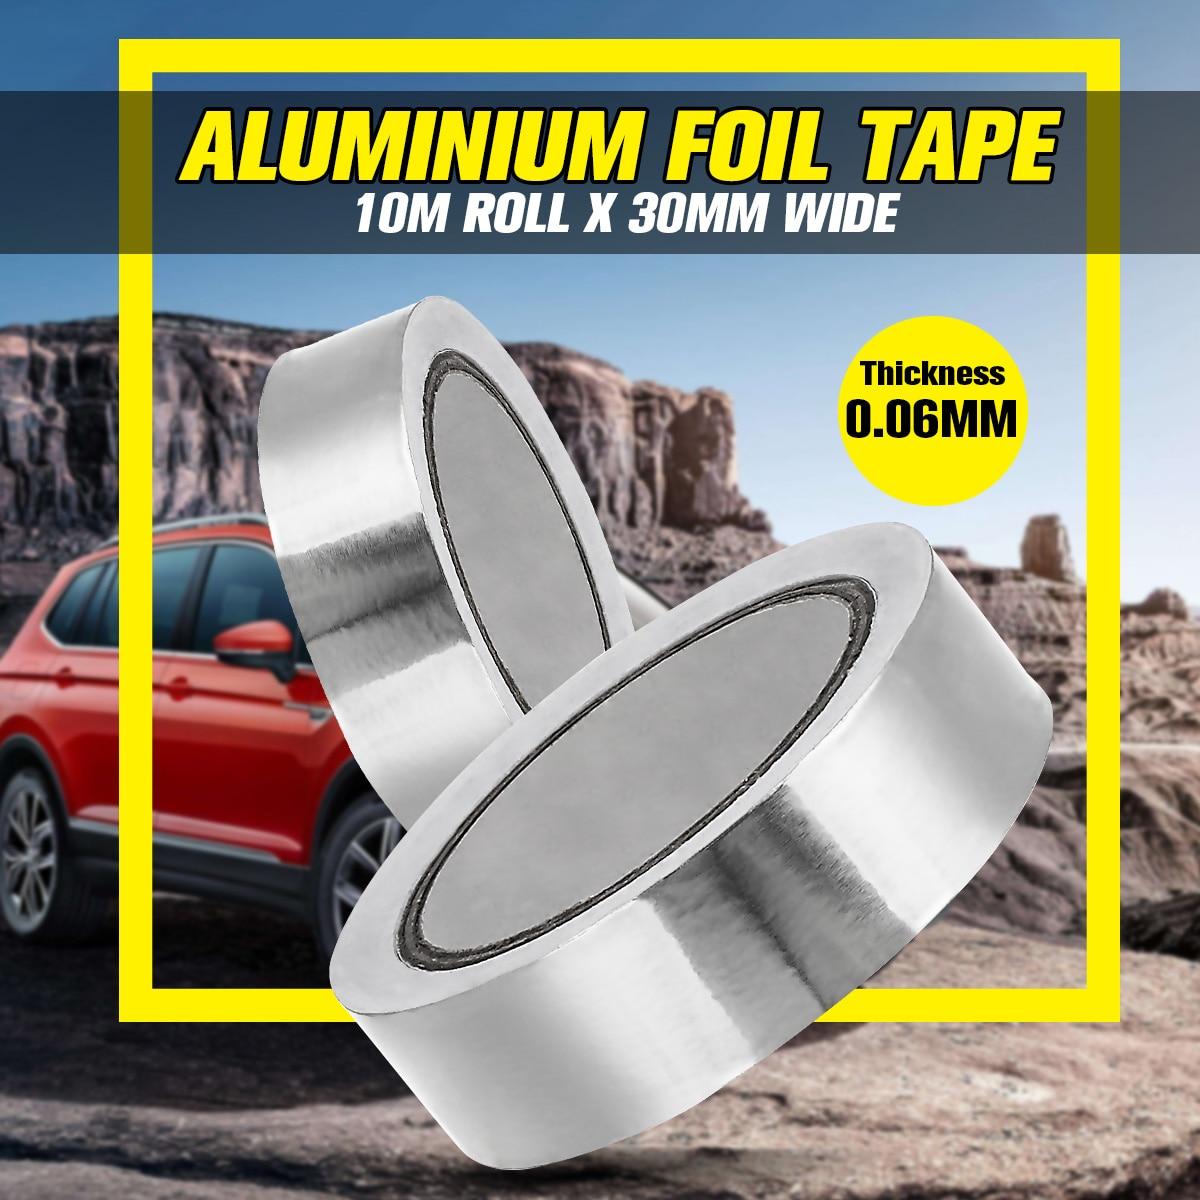 New Chrome Adhesive Car Aluminium Foil Tape Stripe Roll  3cm X 20m With Temperature Stability